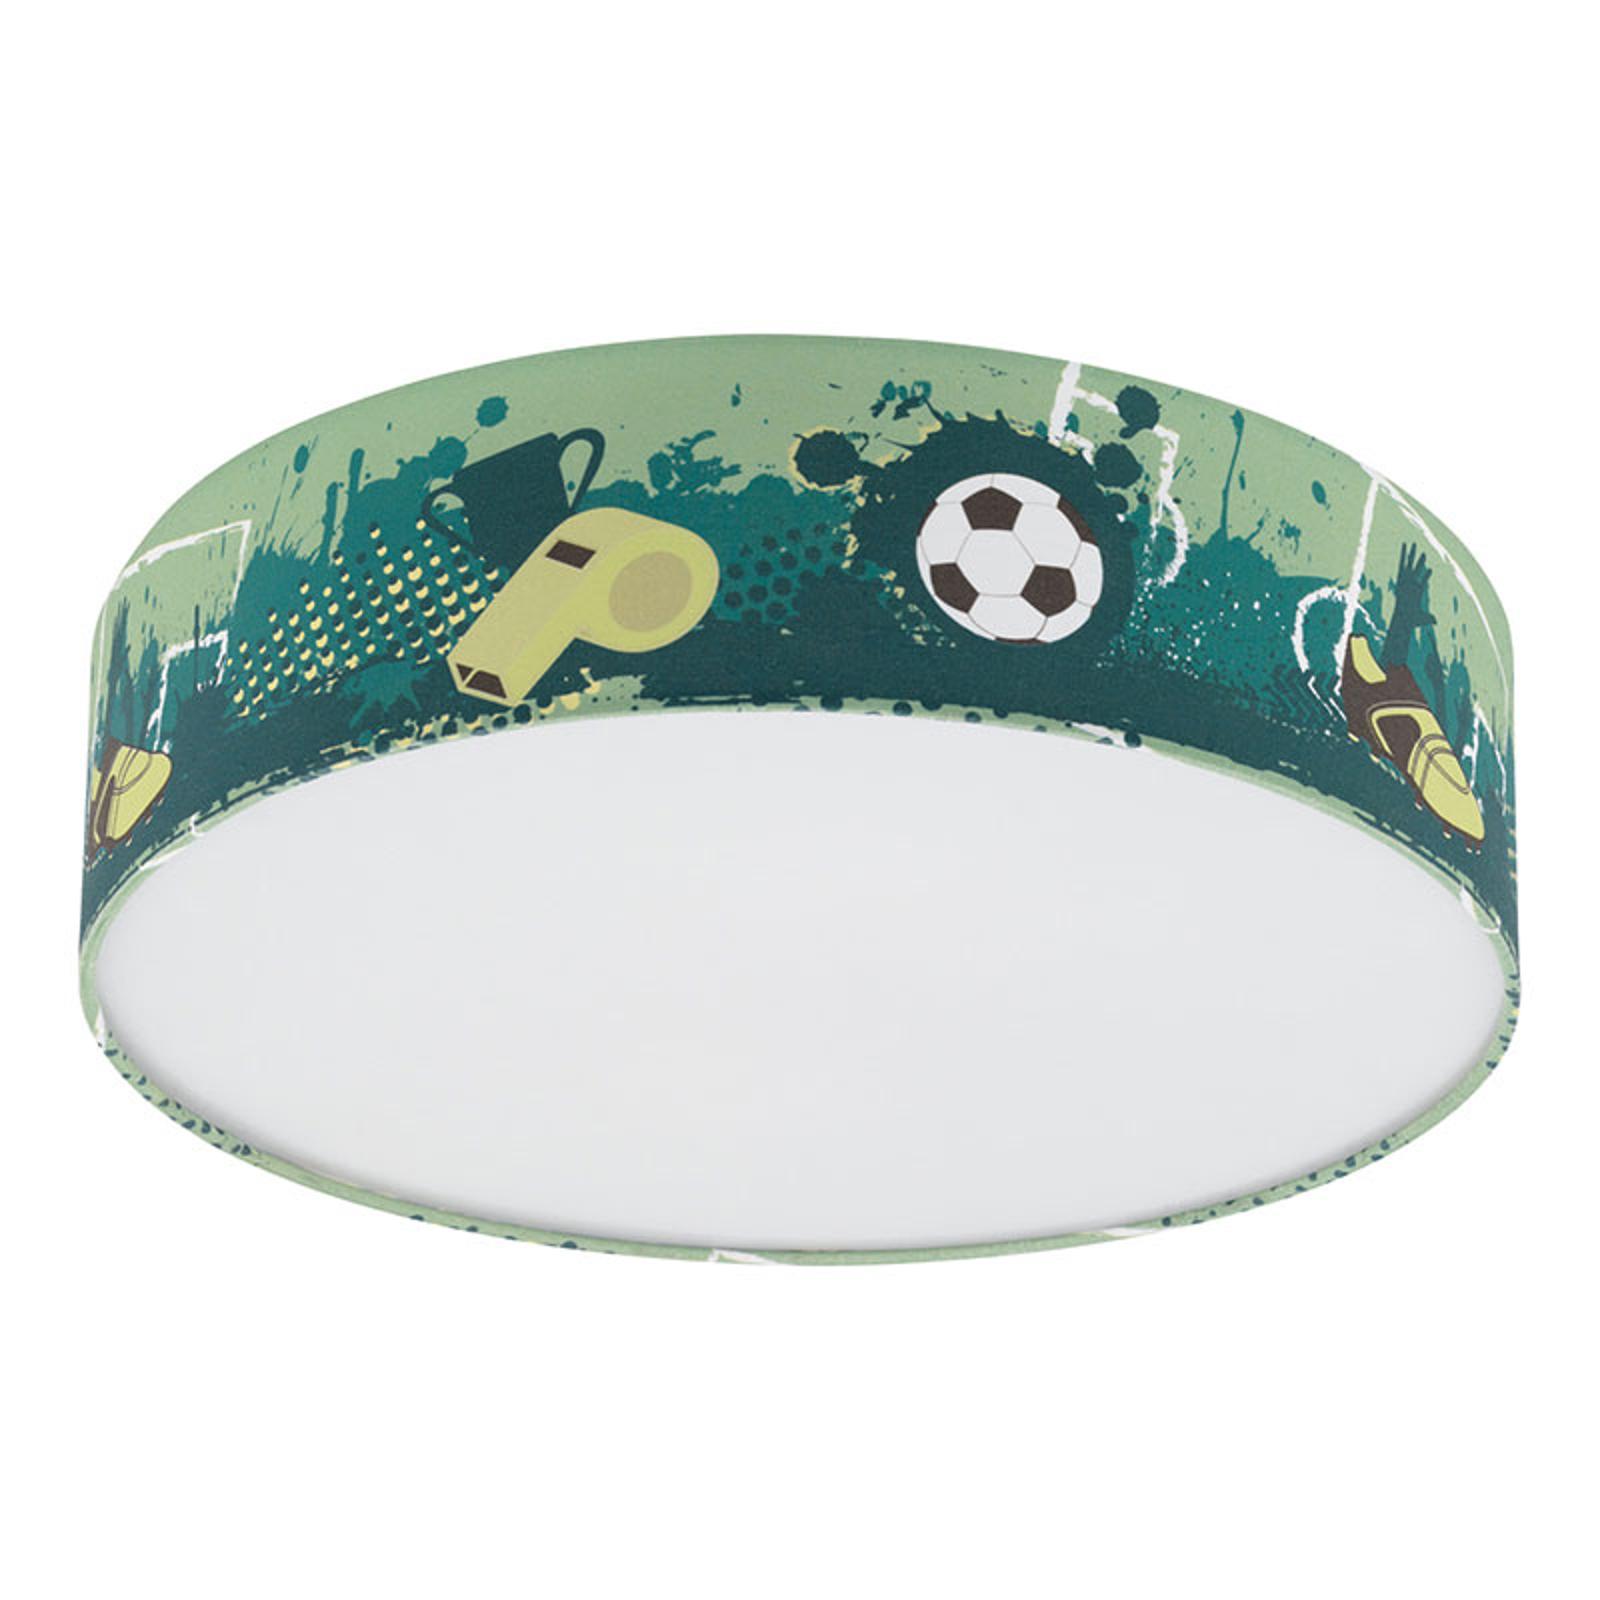 Lampa sufitowa Tabara z motywem piłkarskim tkanina